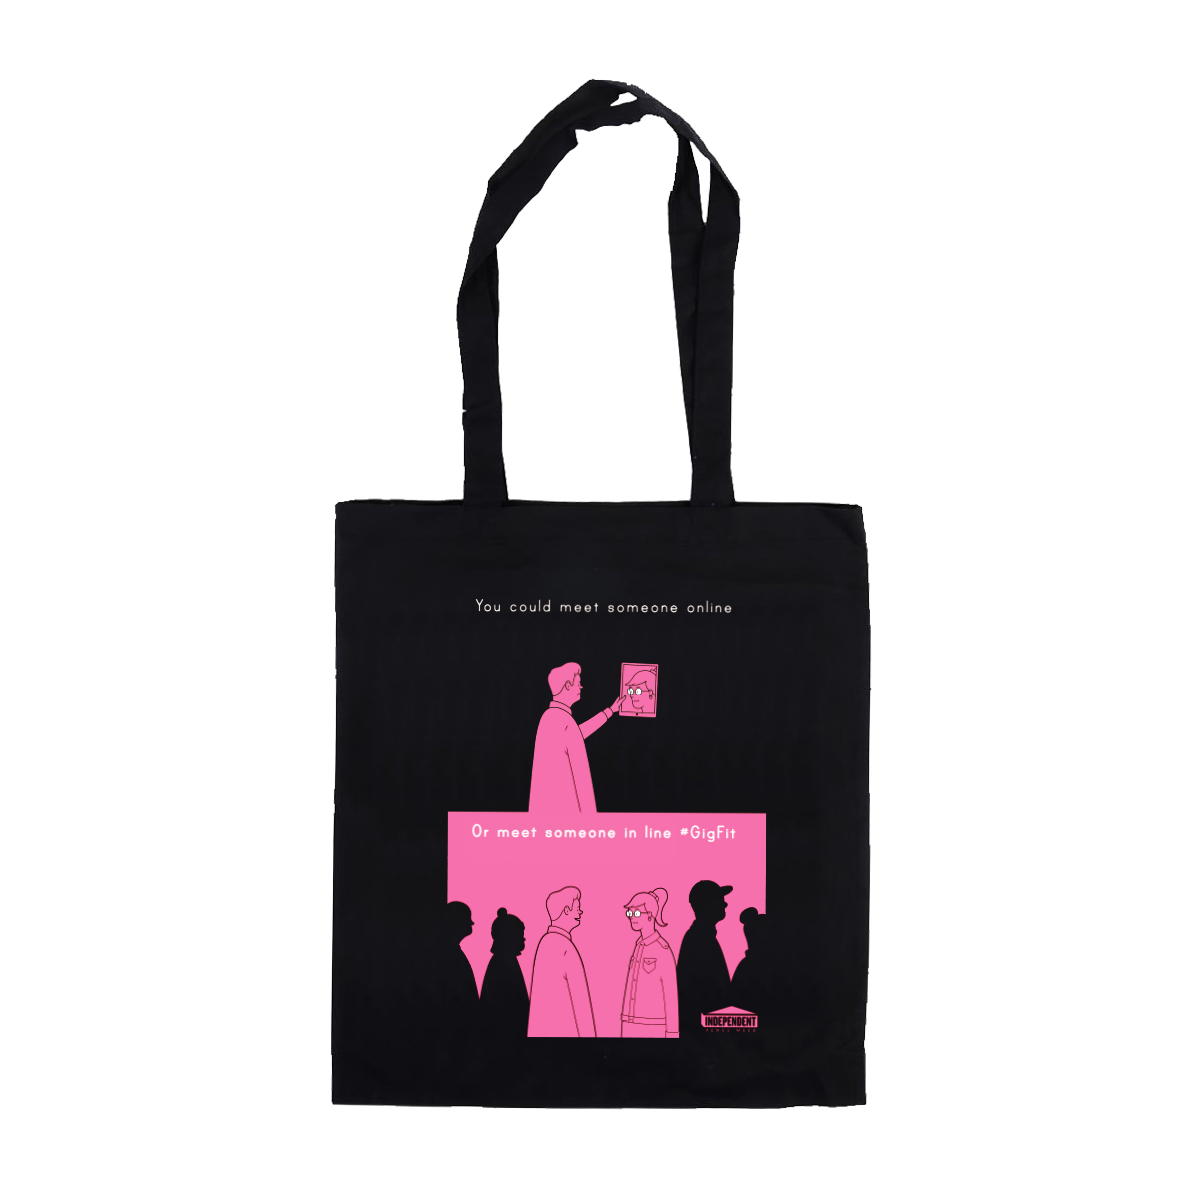 'Gig Fit' Tote Bag (Black)